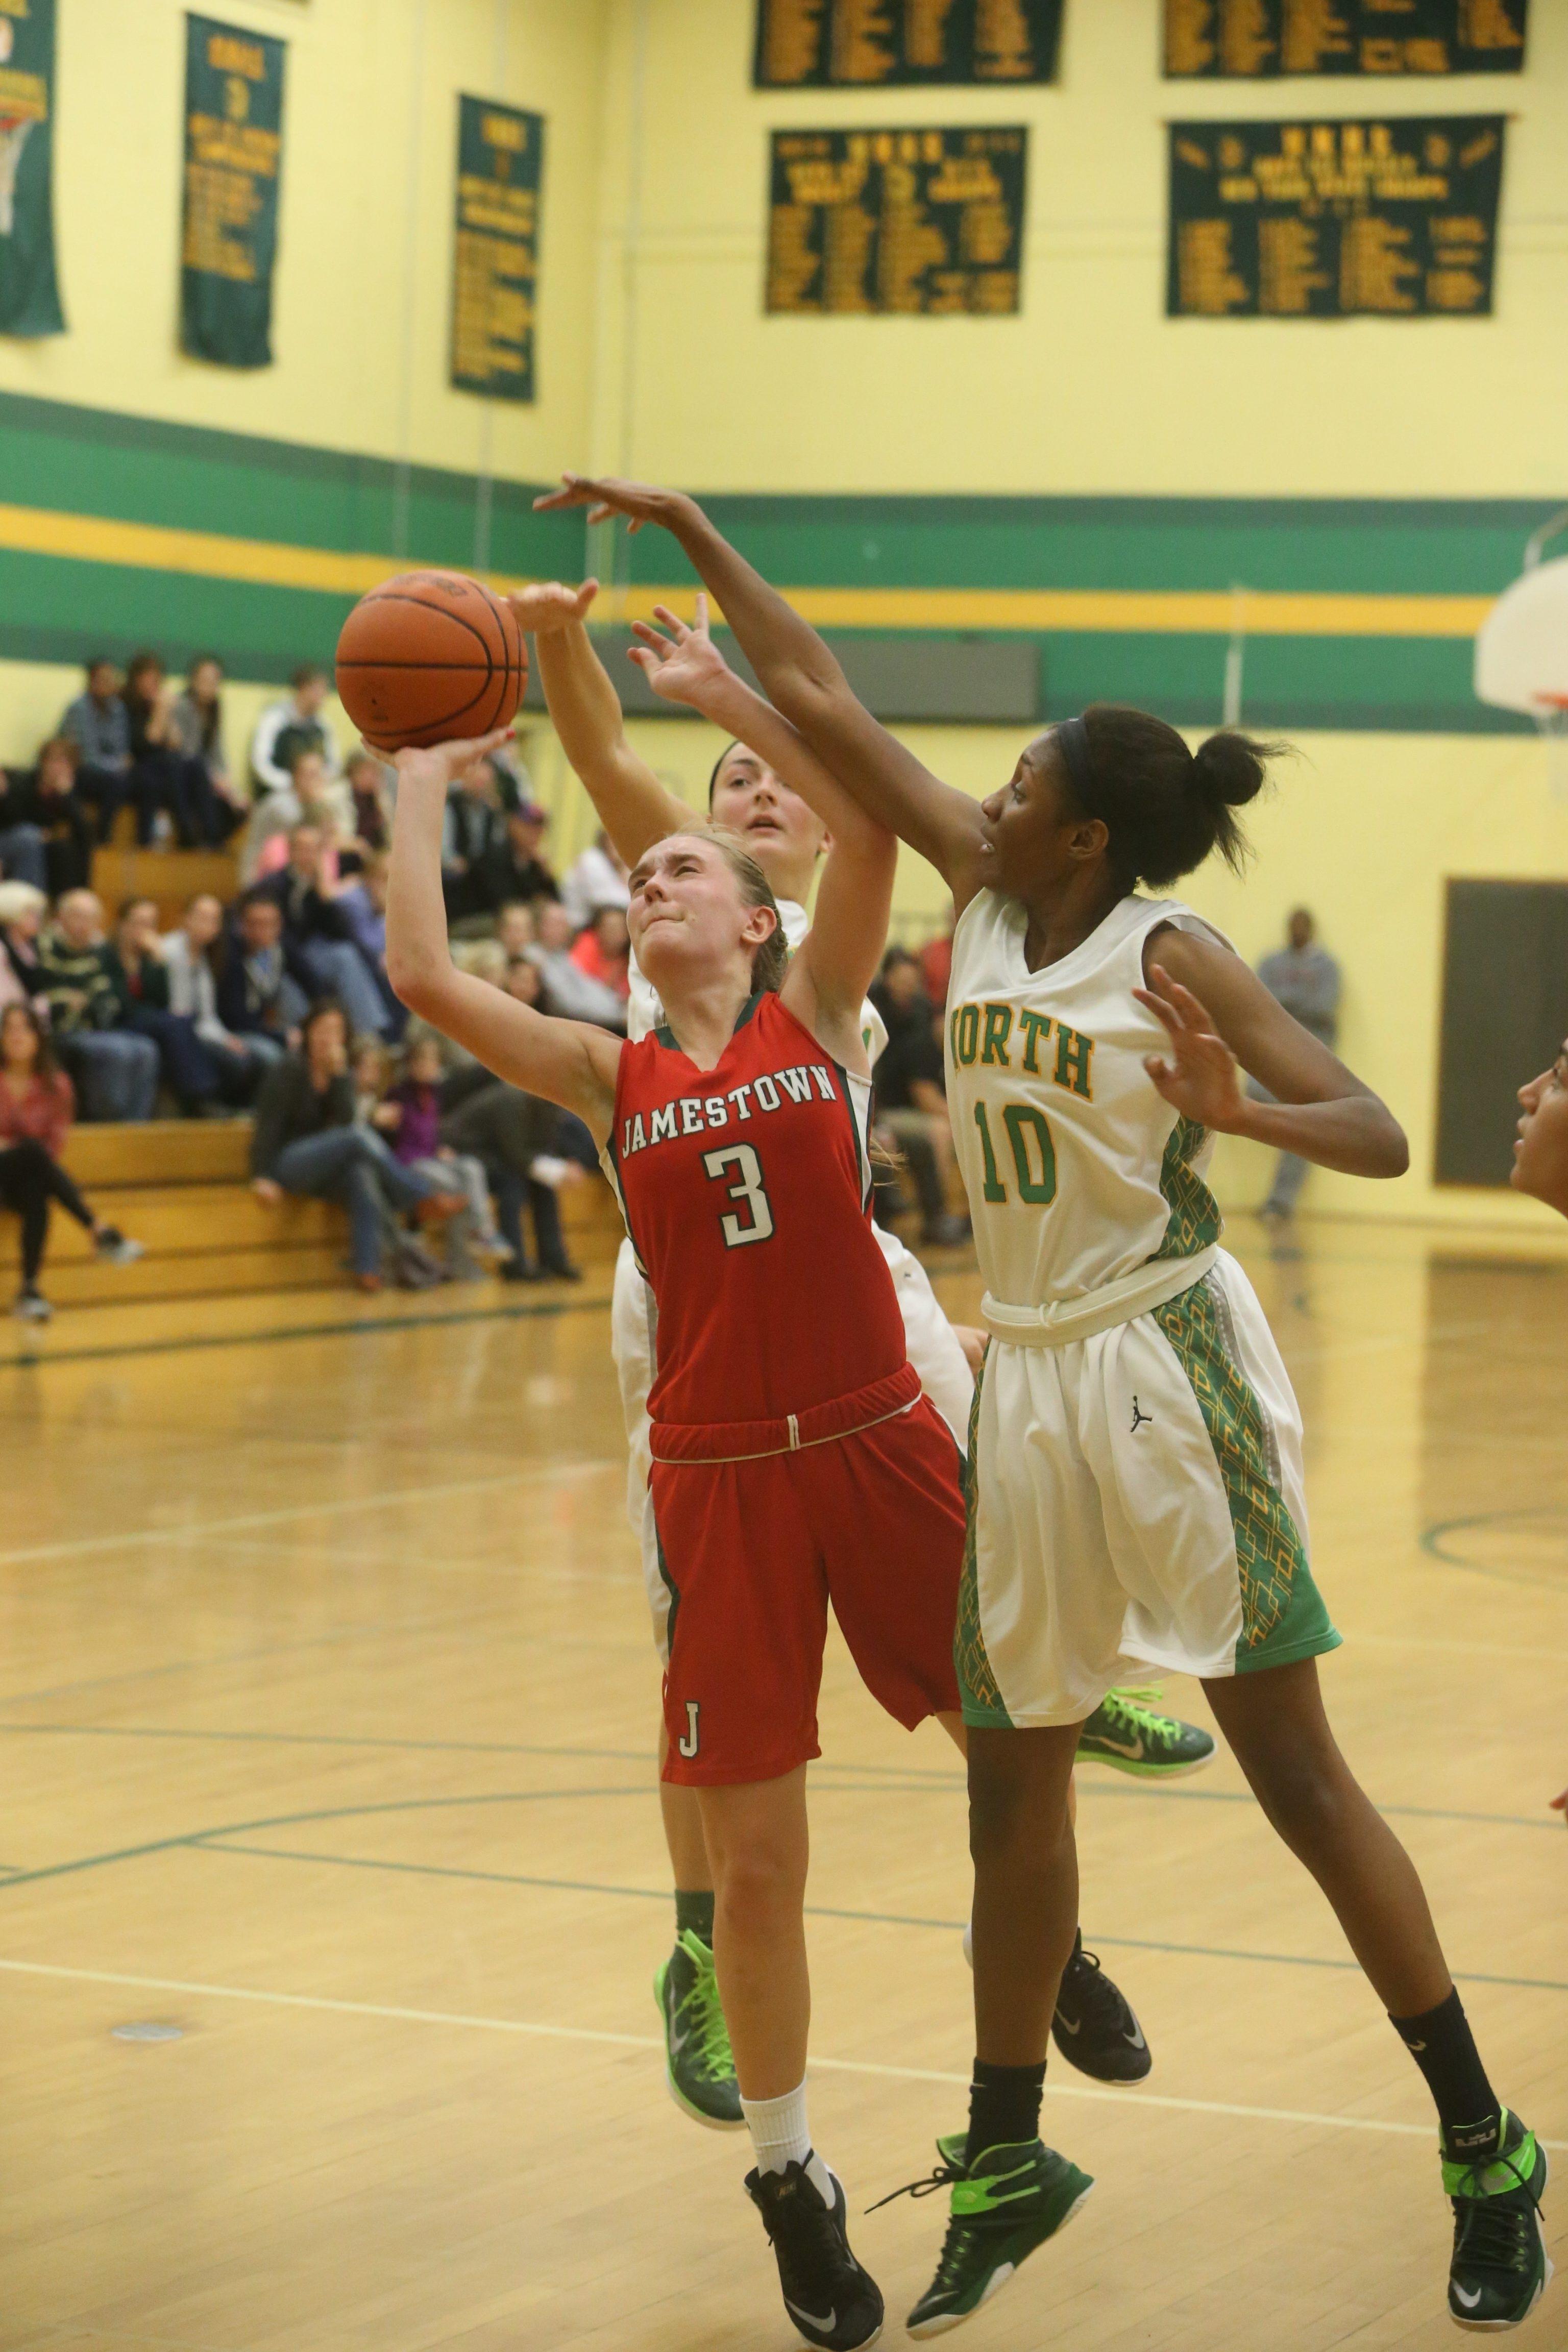 Jamestown's Kate Tucker gets a shot off between Williamsville North's Ericka Taplin, right, and Clare Ahern. Williamsville North won, 33-31.